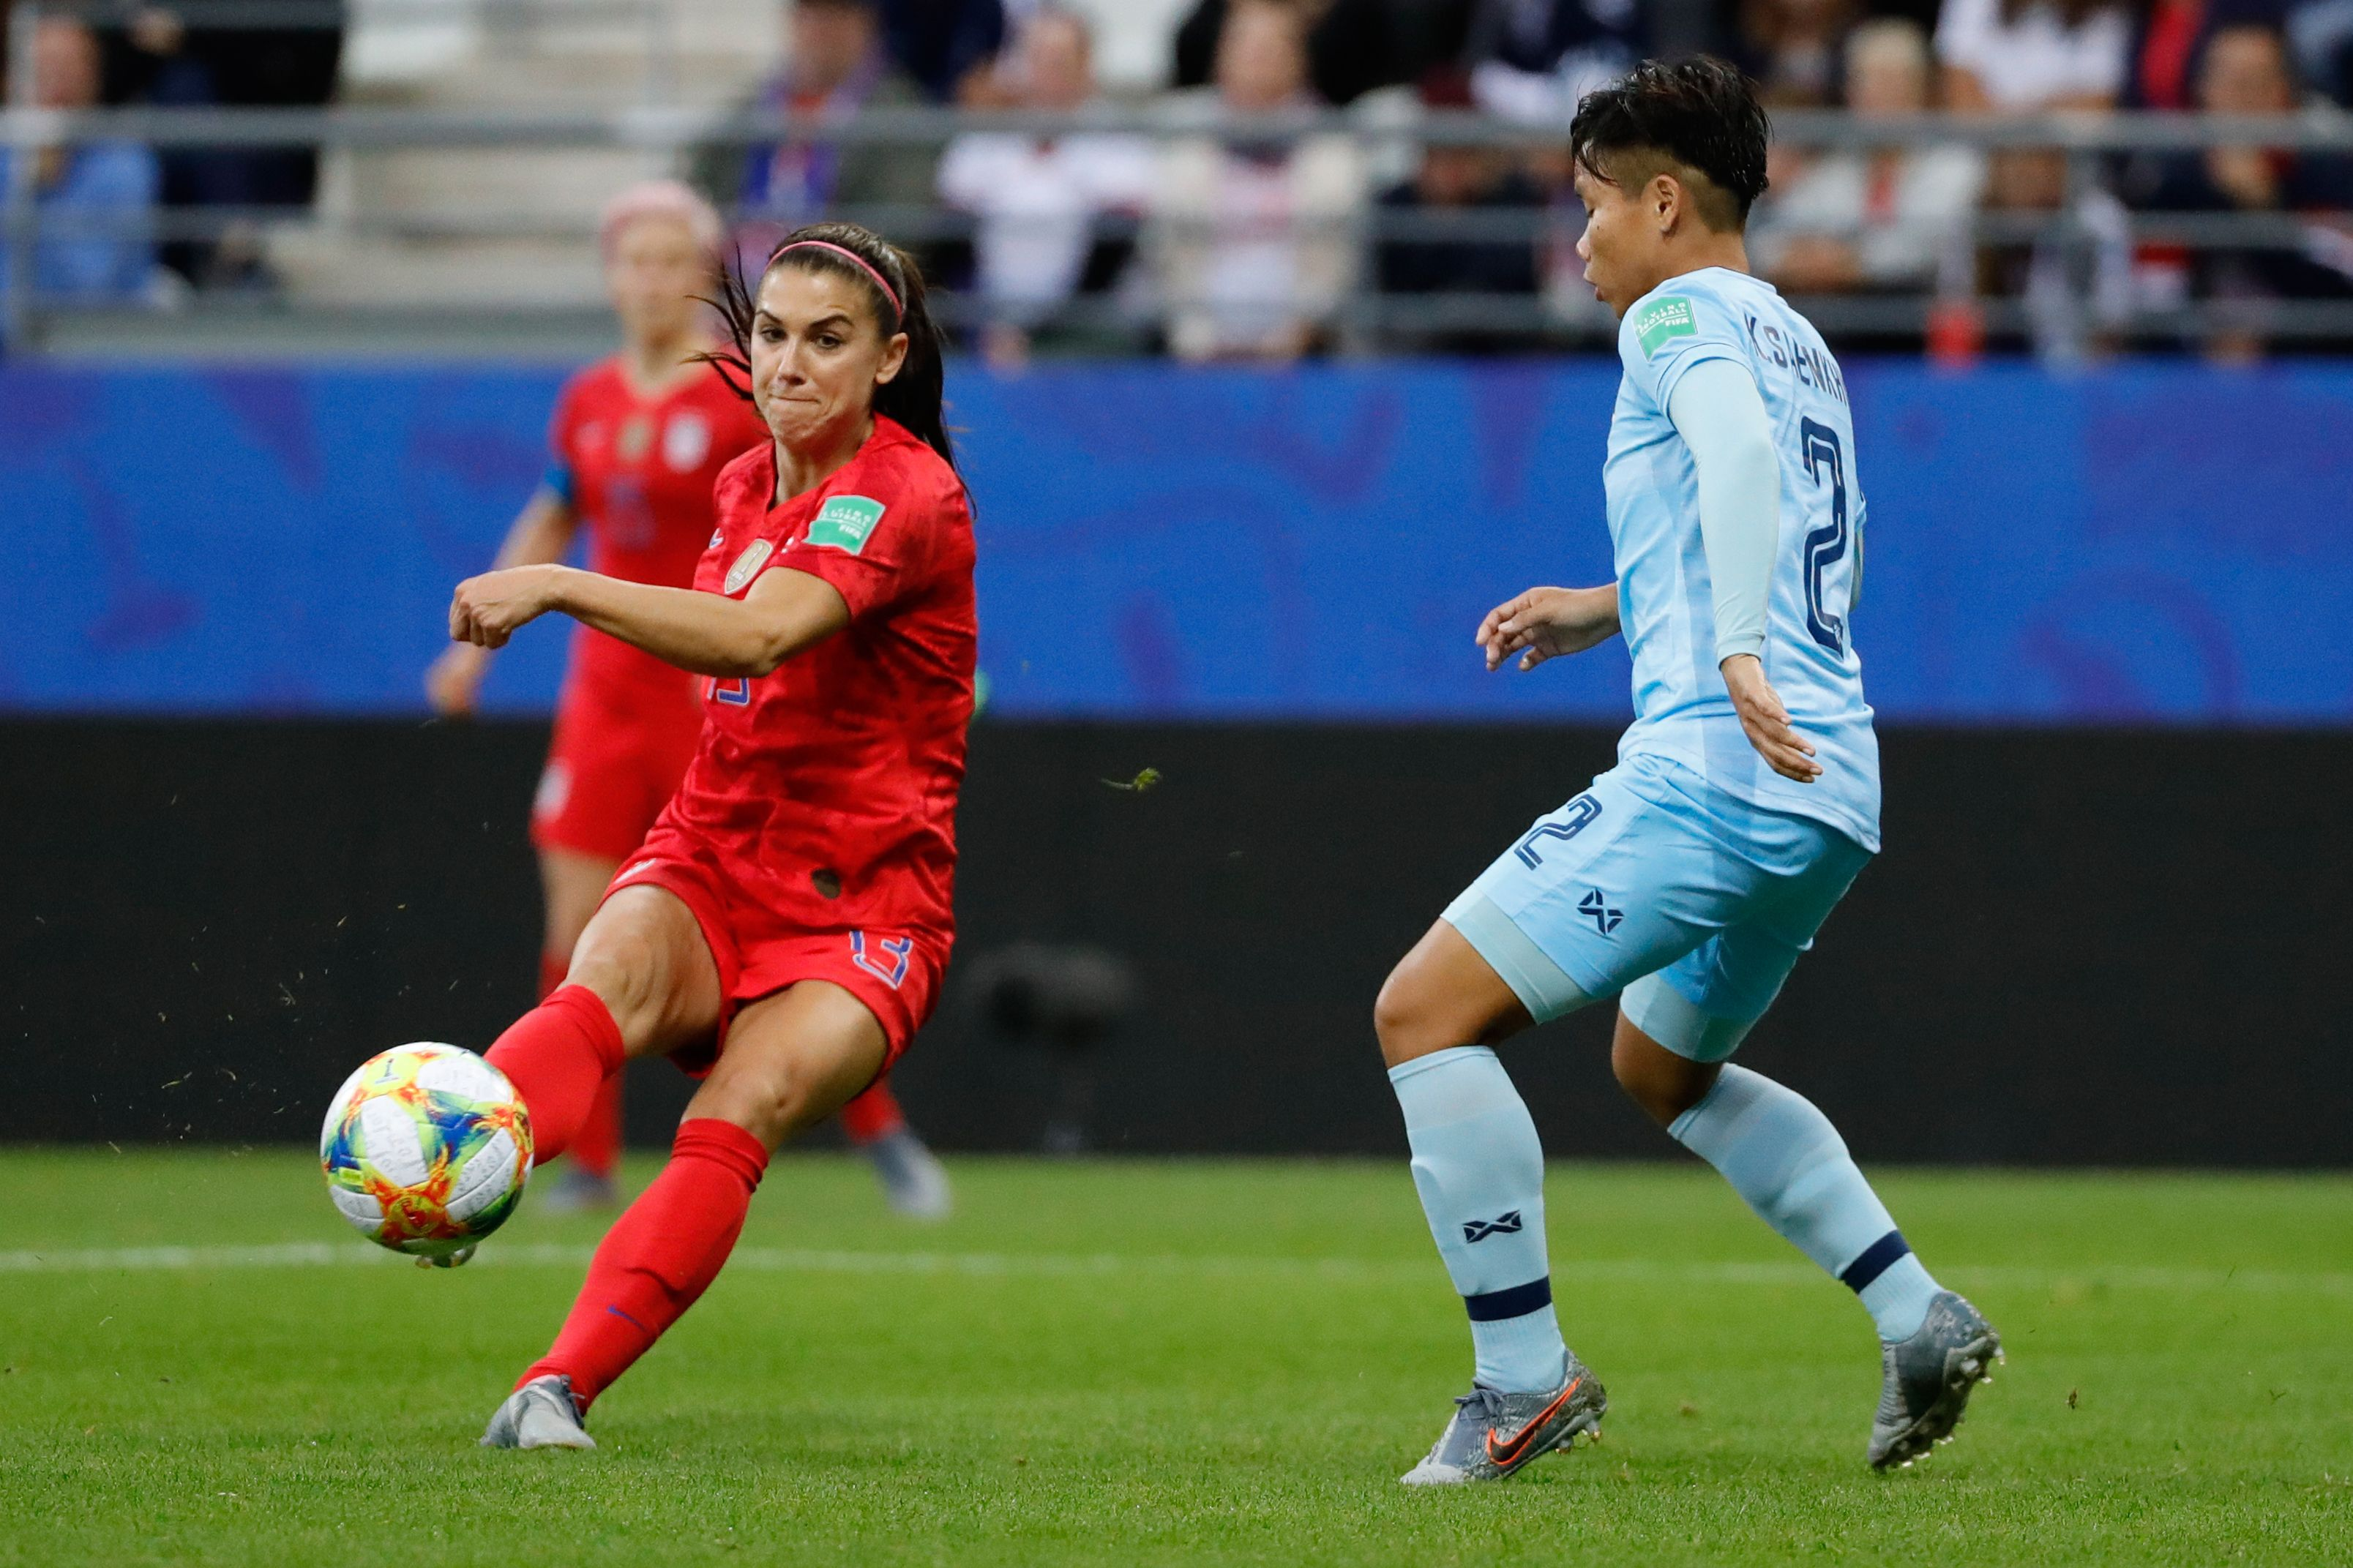 18513153a6f Alex Morgan has record five goals as U.S. routs Thailand 13-0 in Women's  World Cup